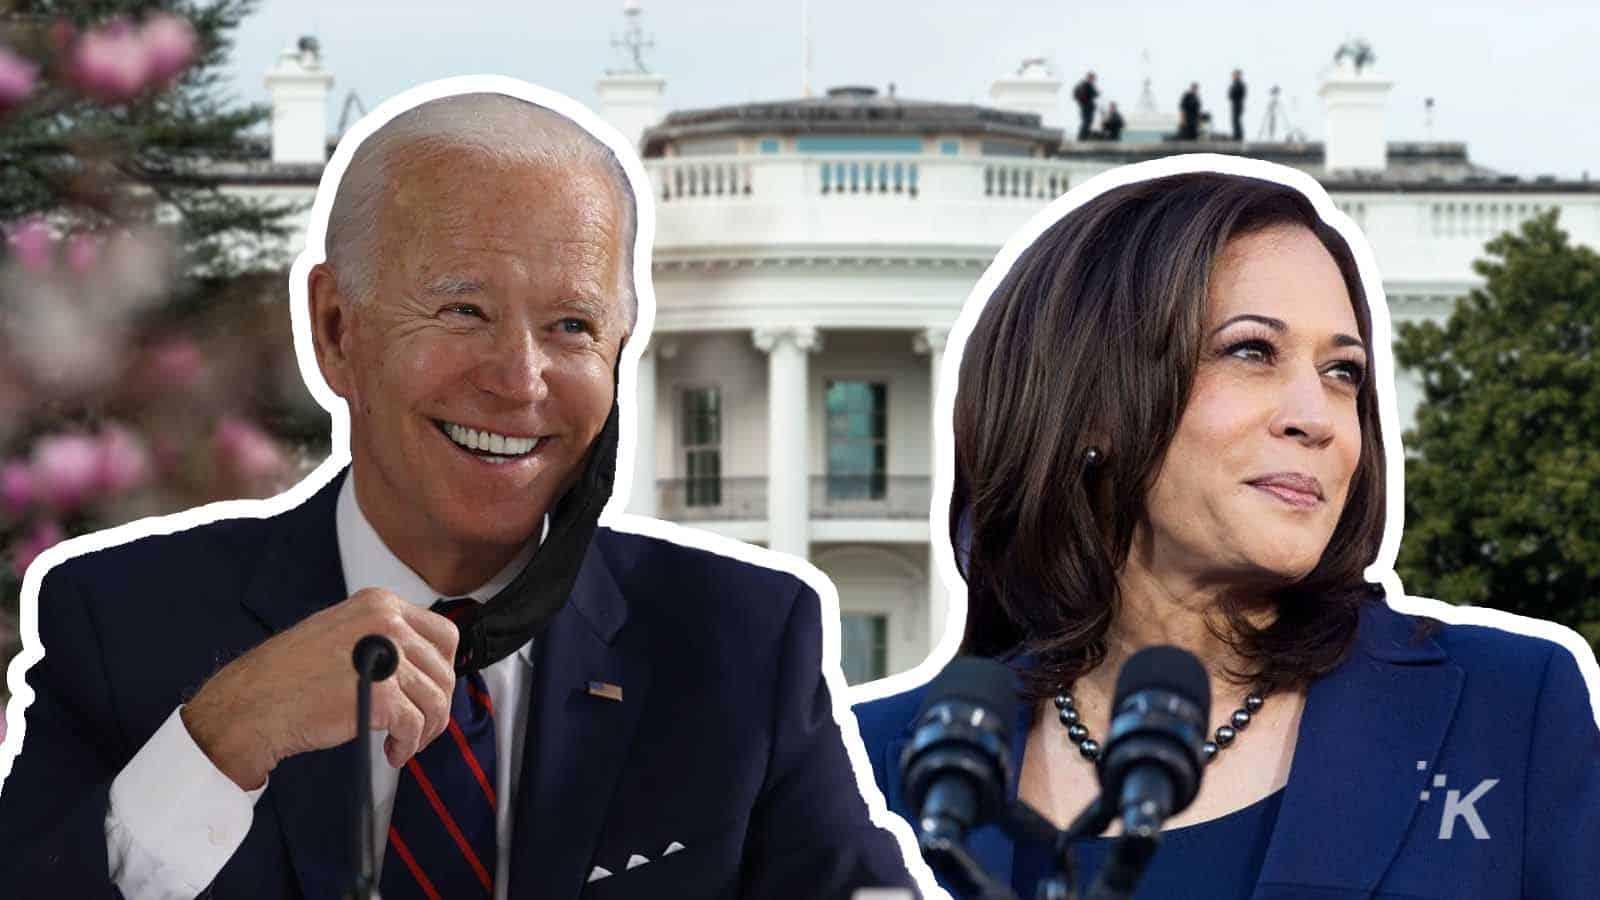 joe biden and kamala harris presidential inauguration internet